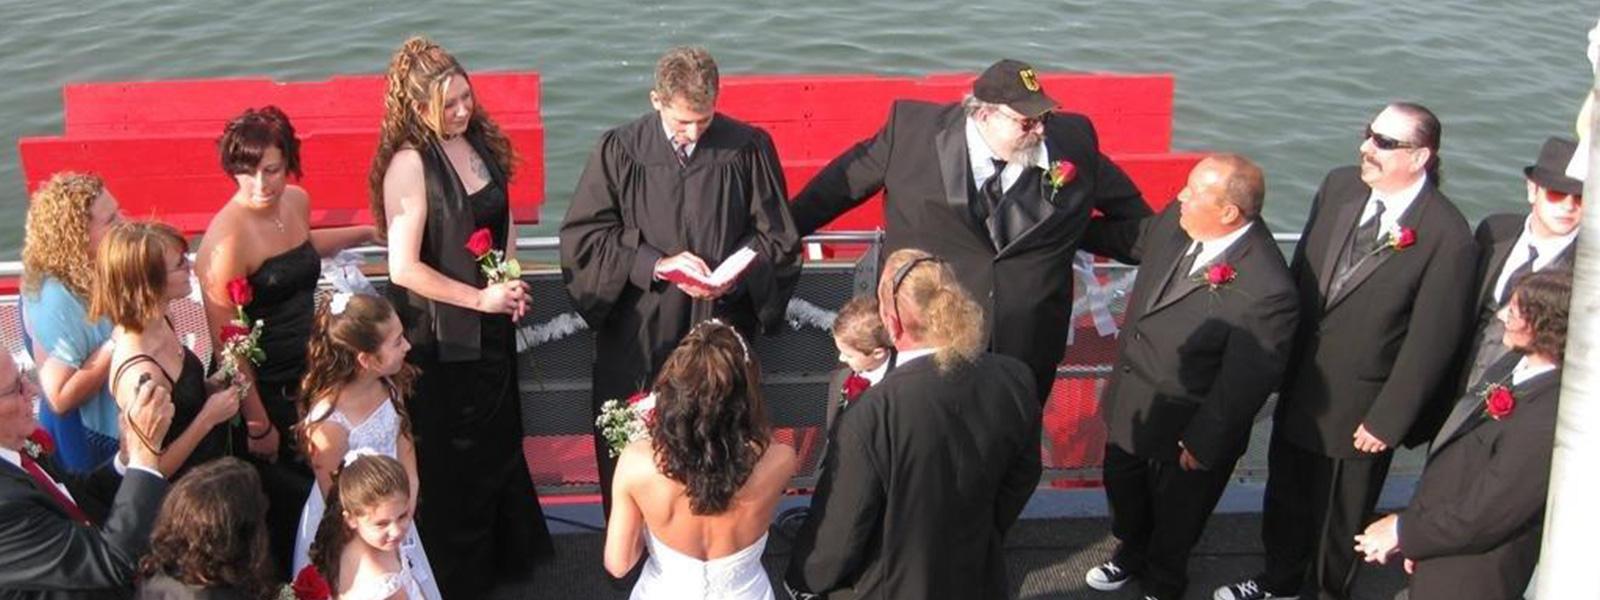 Wedding on the cruise